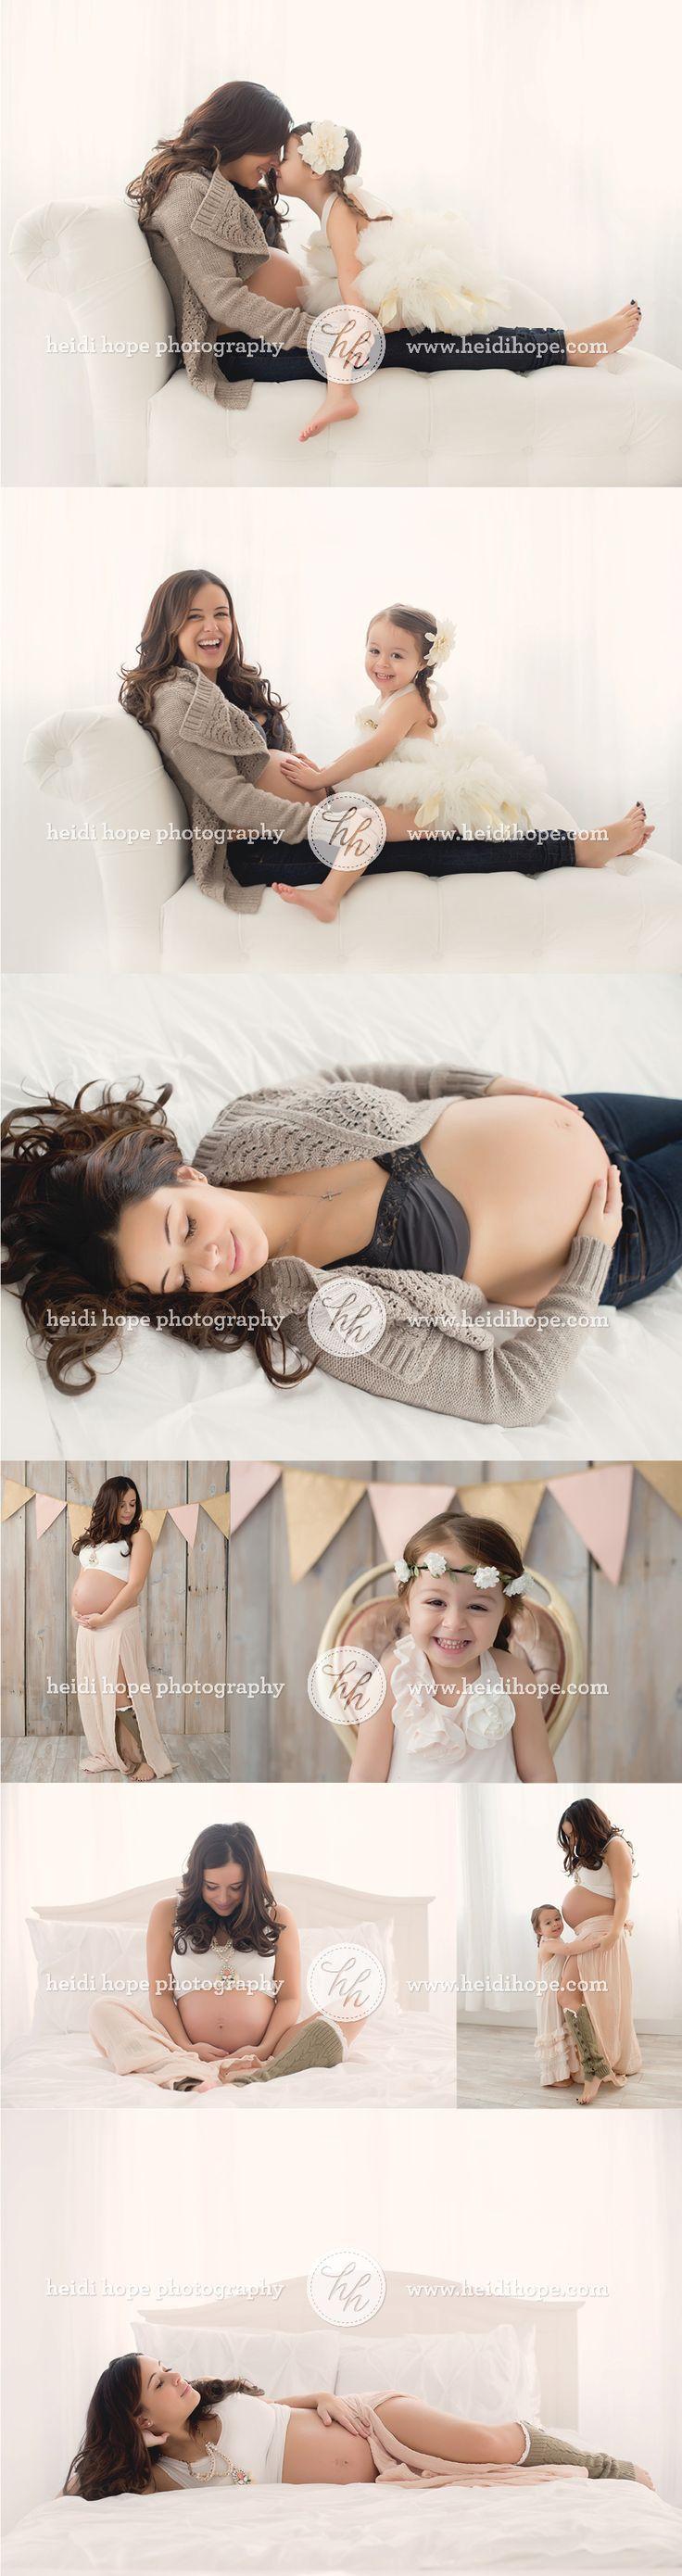 Pregnancy shoot #Photo #Inspiration #Pregnancy #Baby belly    – Ein Babybauch ka…